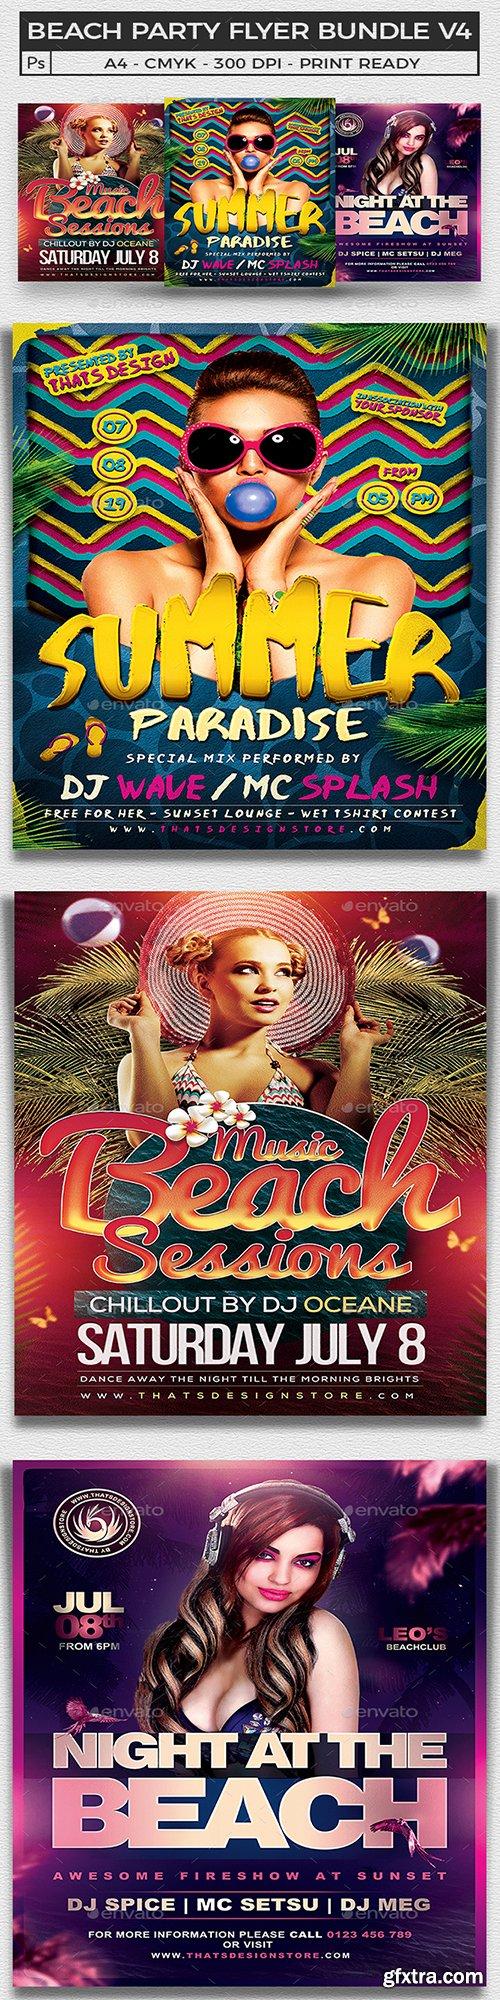 Graphicriver - Beach Party Flyer Bundle V4 19922557